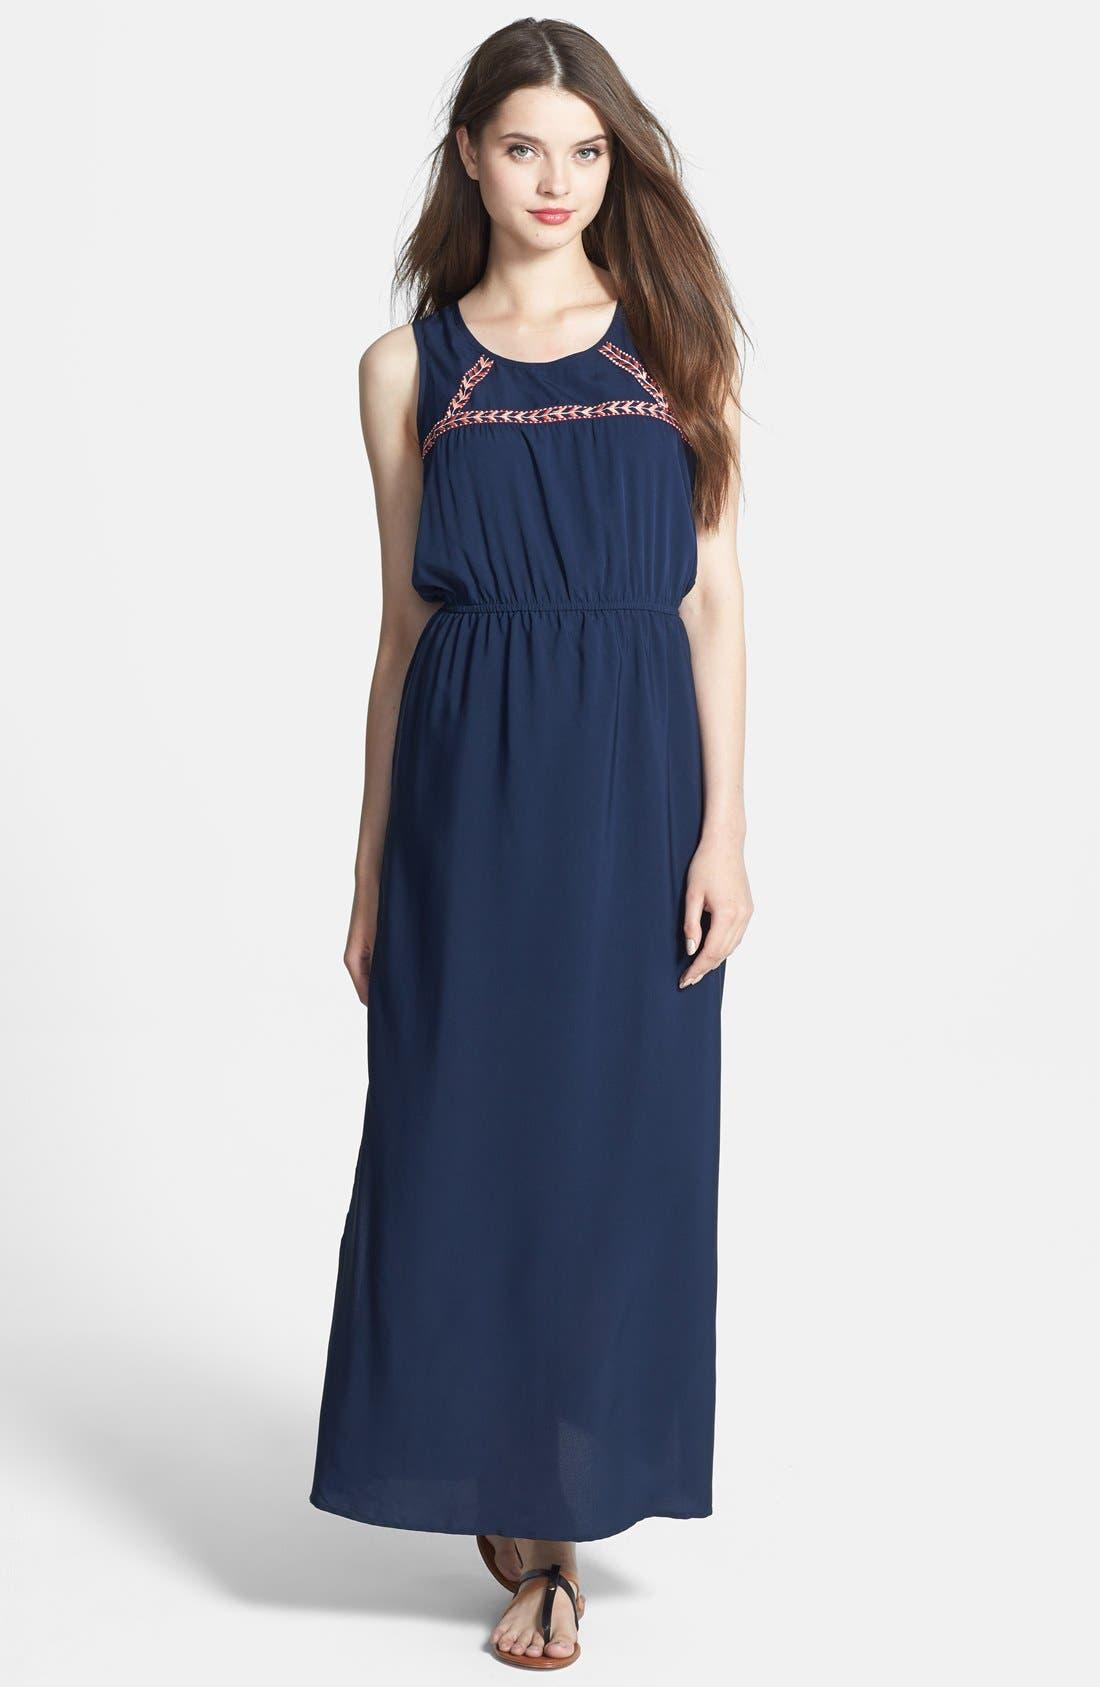 Alternate Image 1 Selected - Olive & Oak Embroidered Trim Maxi Dress